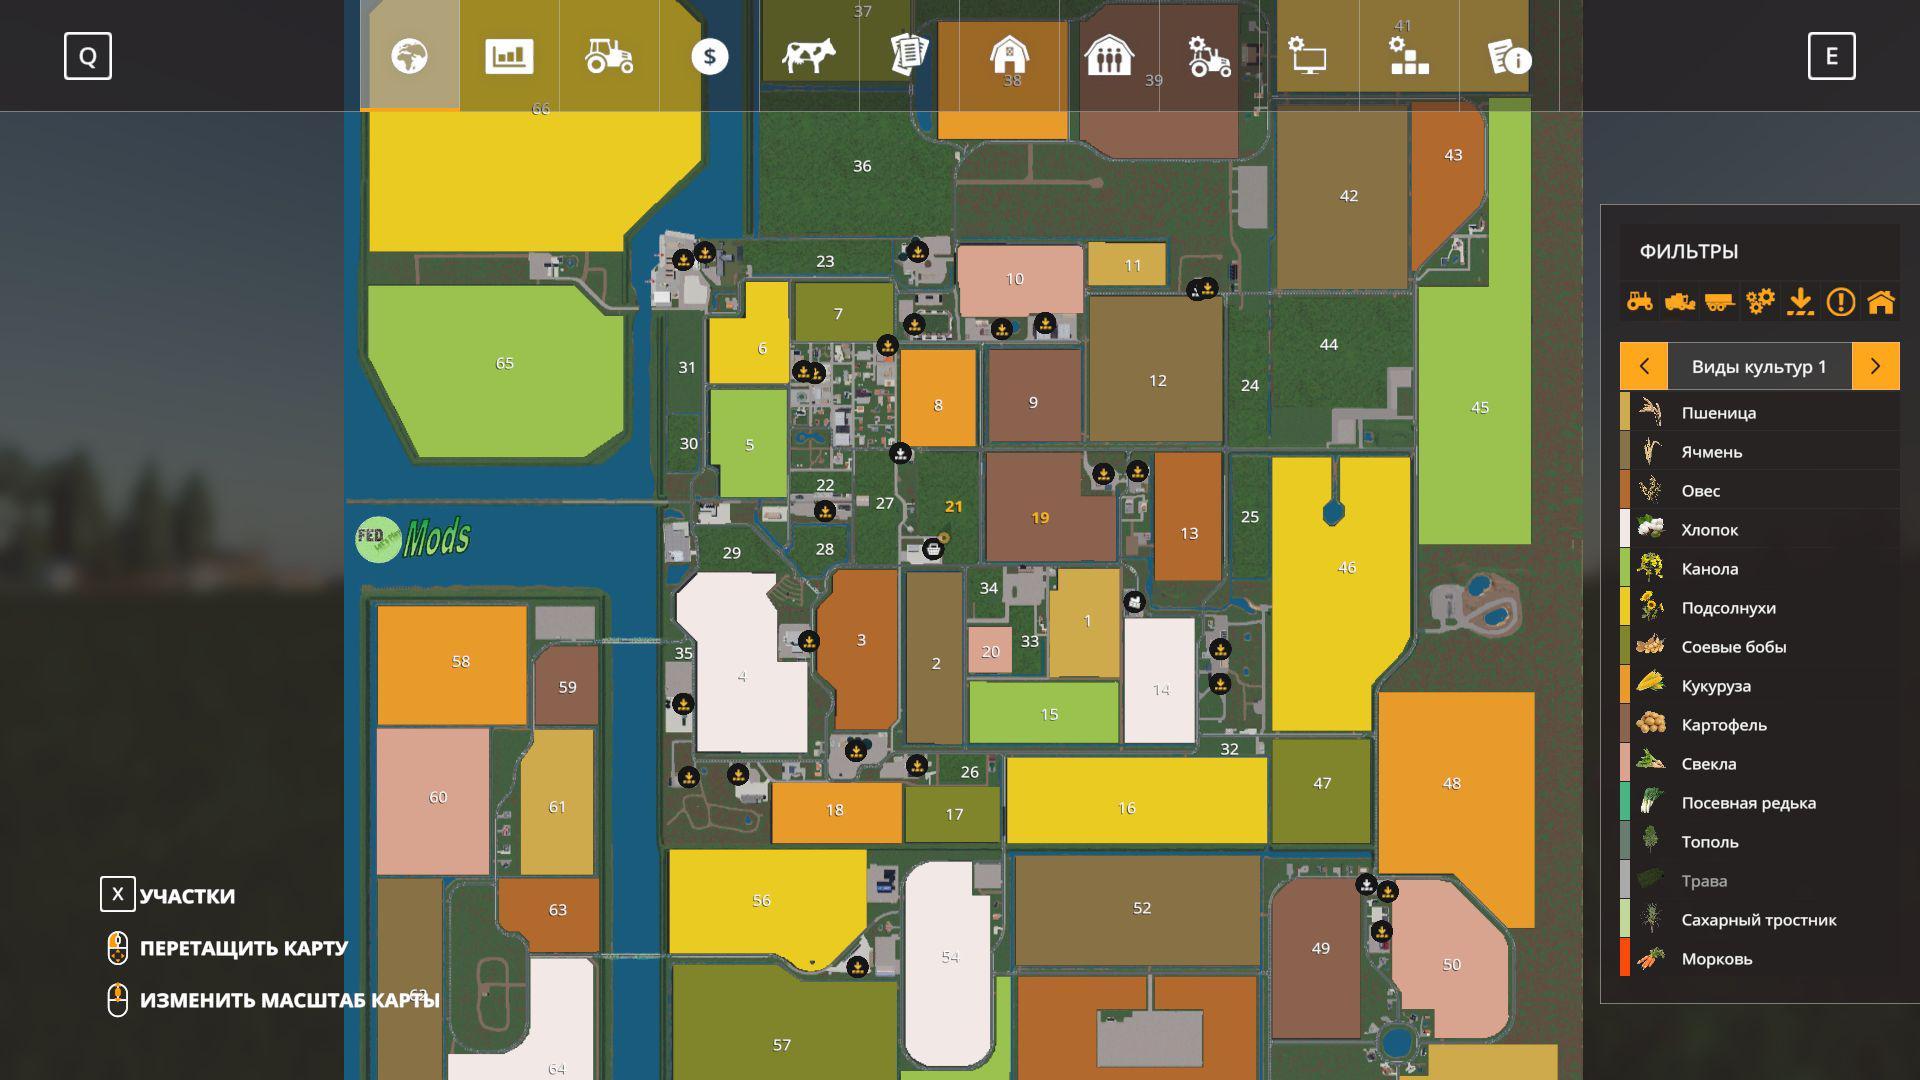 Us map v2.1 ravenport edit. Nf Marsch 4fach Og Rus V2 0 Map Farming Simulator 2019 19 Mod